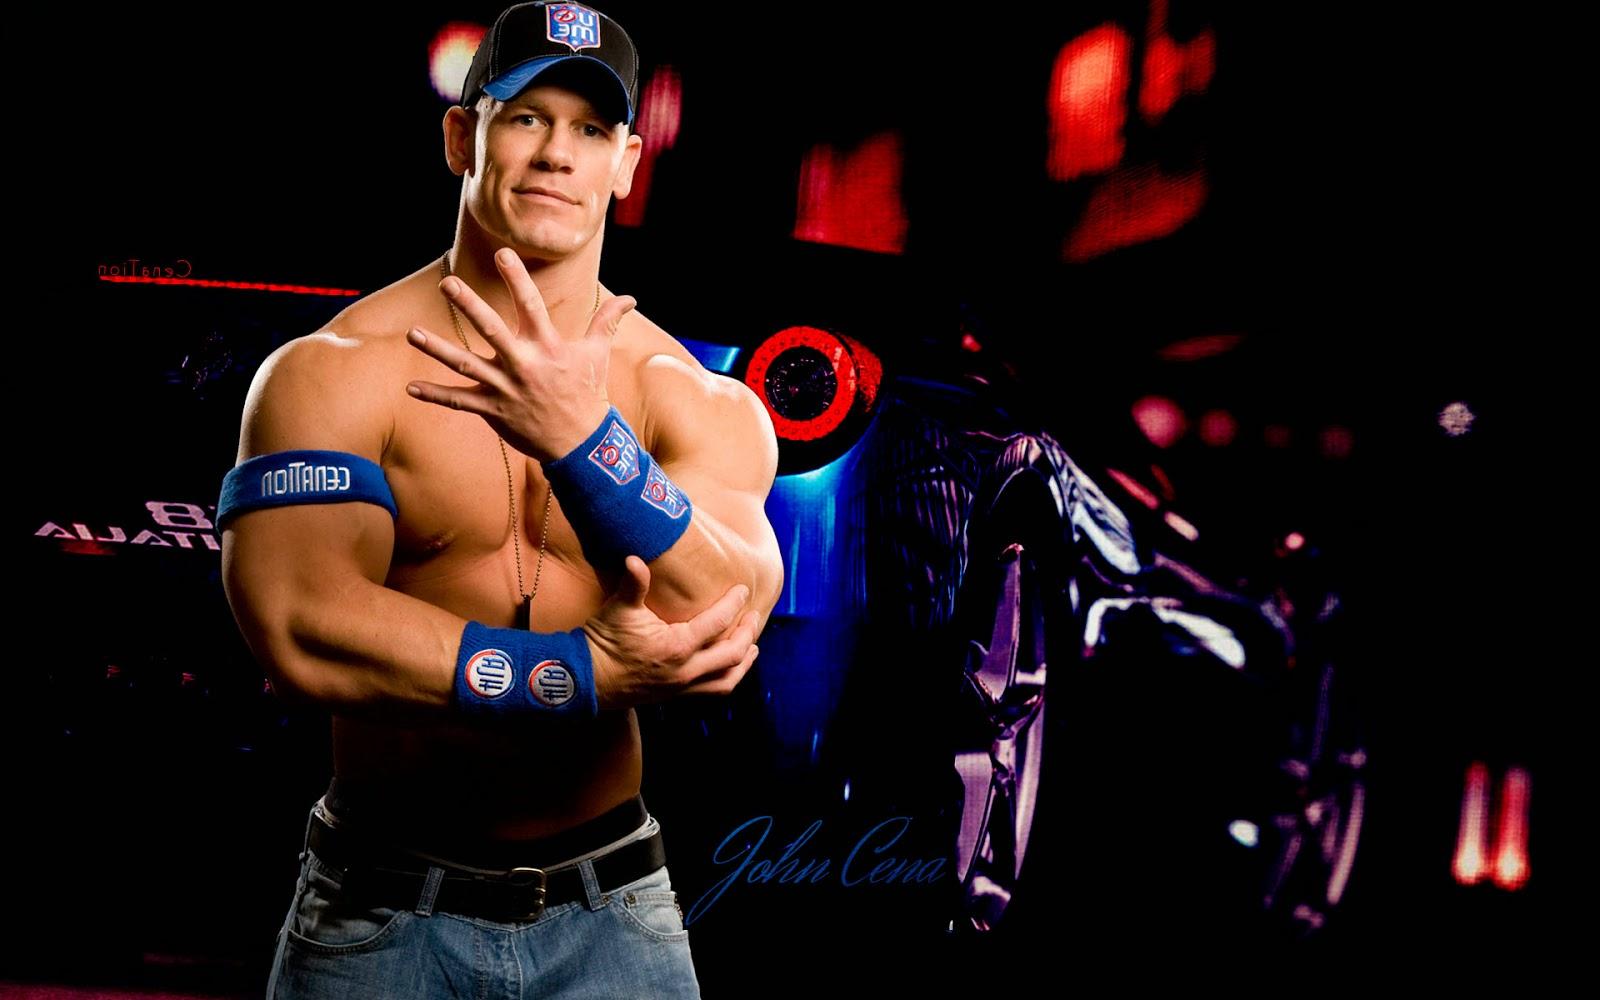 WWE John Cena Fresh HD Wallpapers